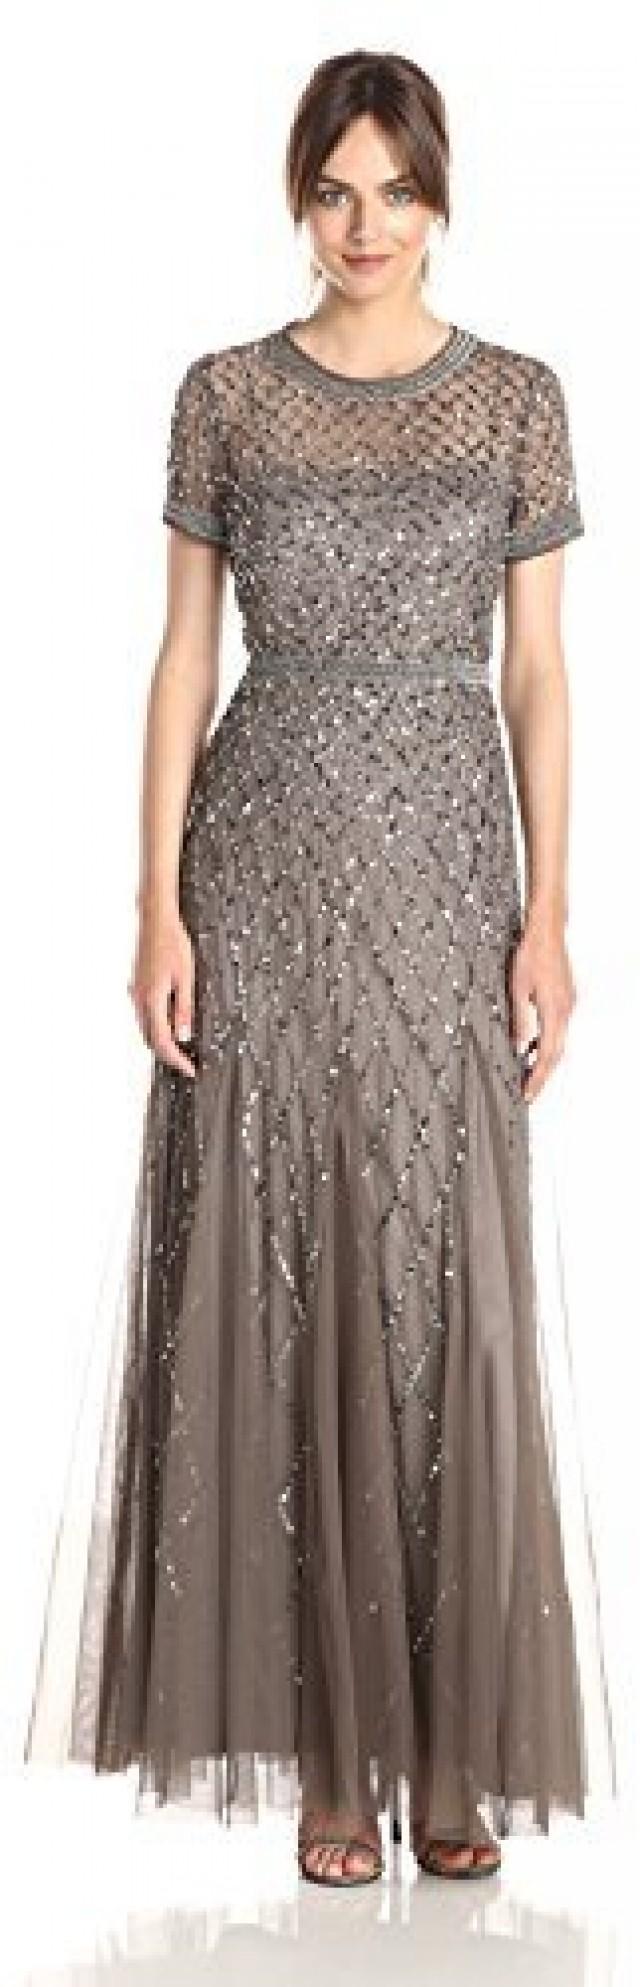 Adrianna Papell Women\'s Short-Sleeve Beaded Mesh Gown #2378467 ...